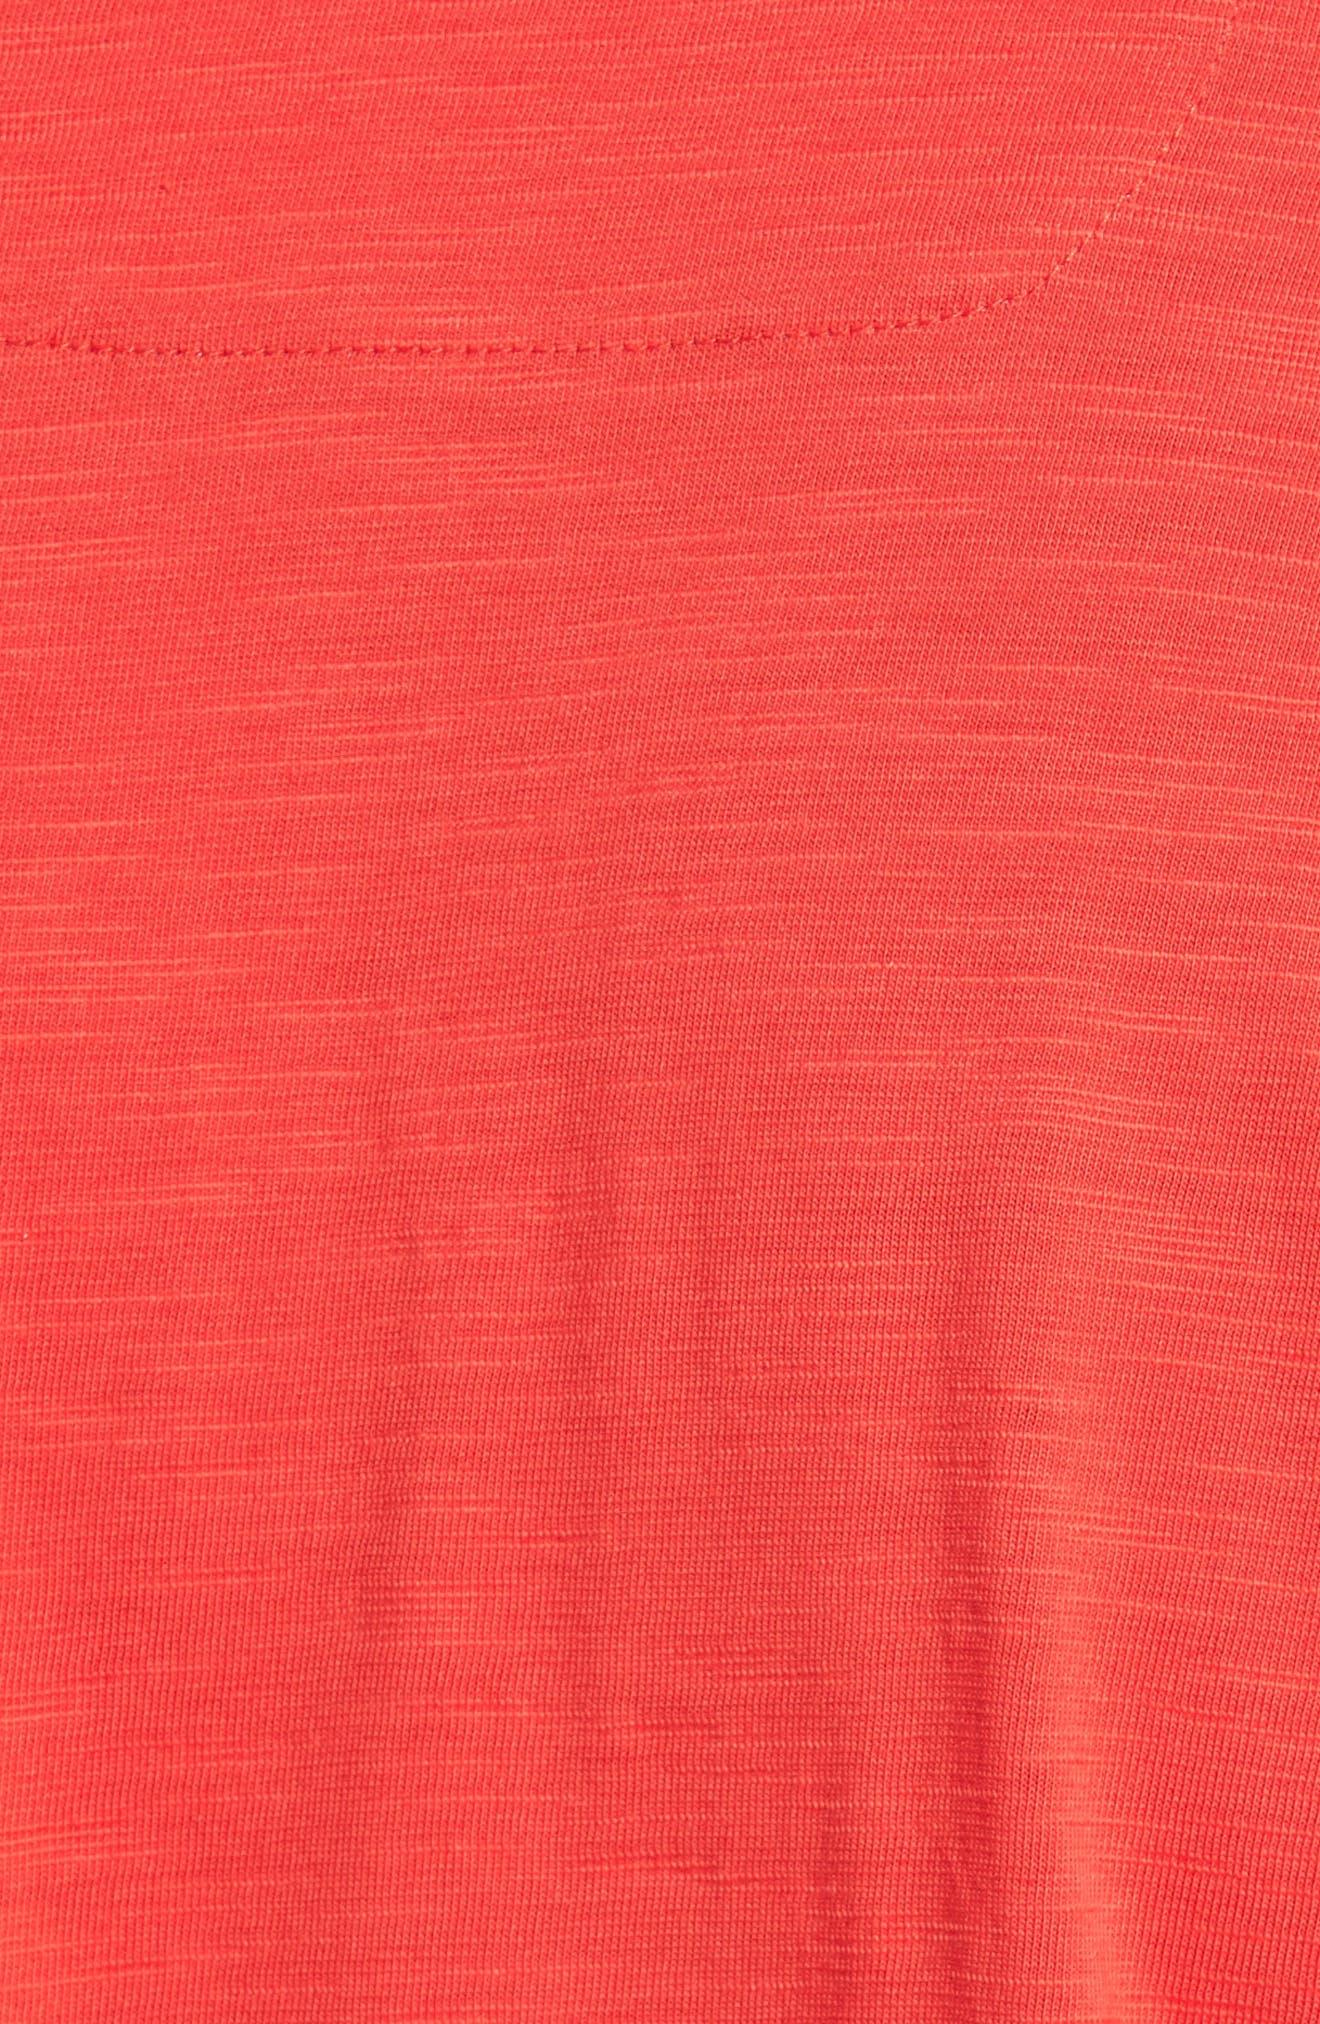 'Portside Player Spectator' Regular Pima Cotton Polo,                             Alternate thumbnail 68, color,